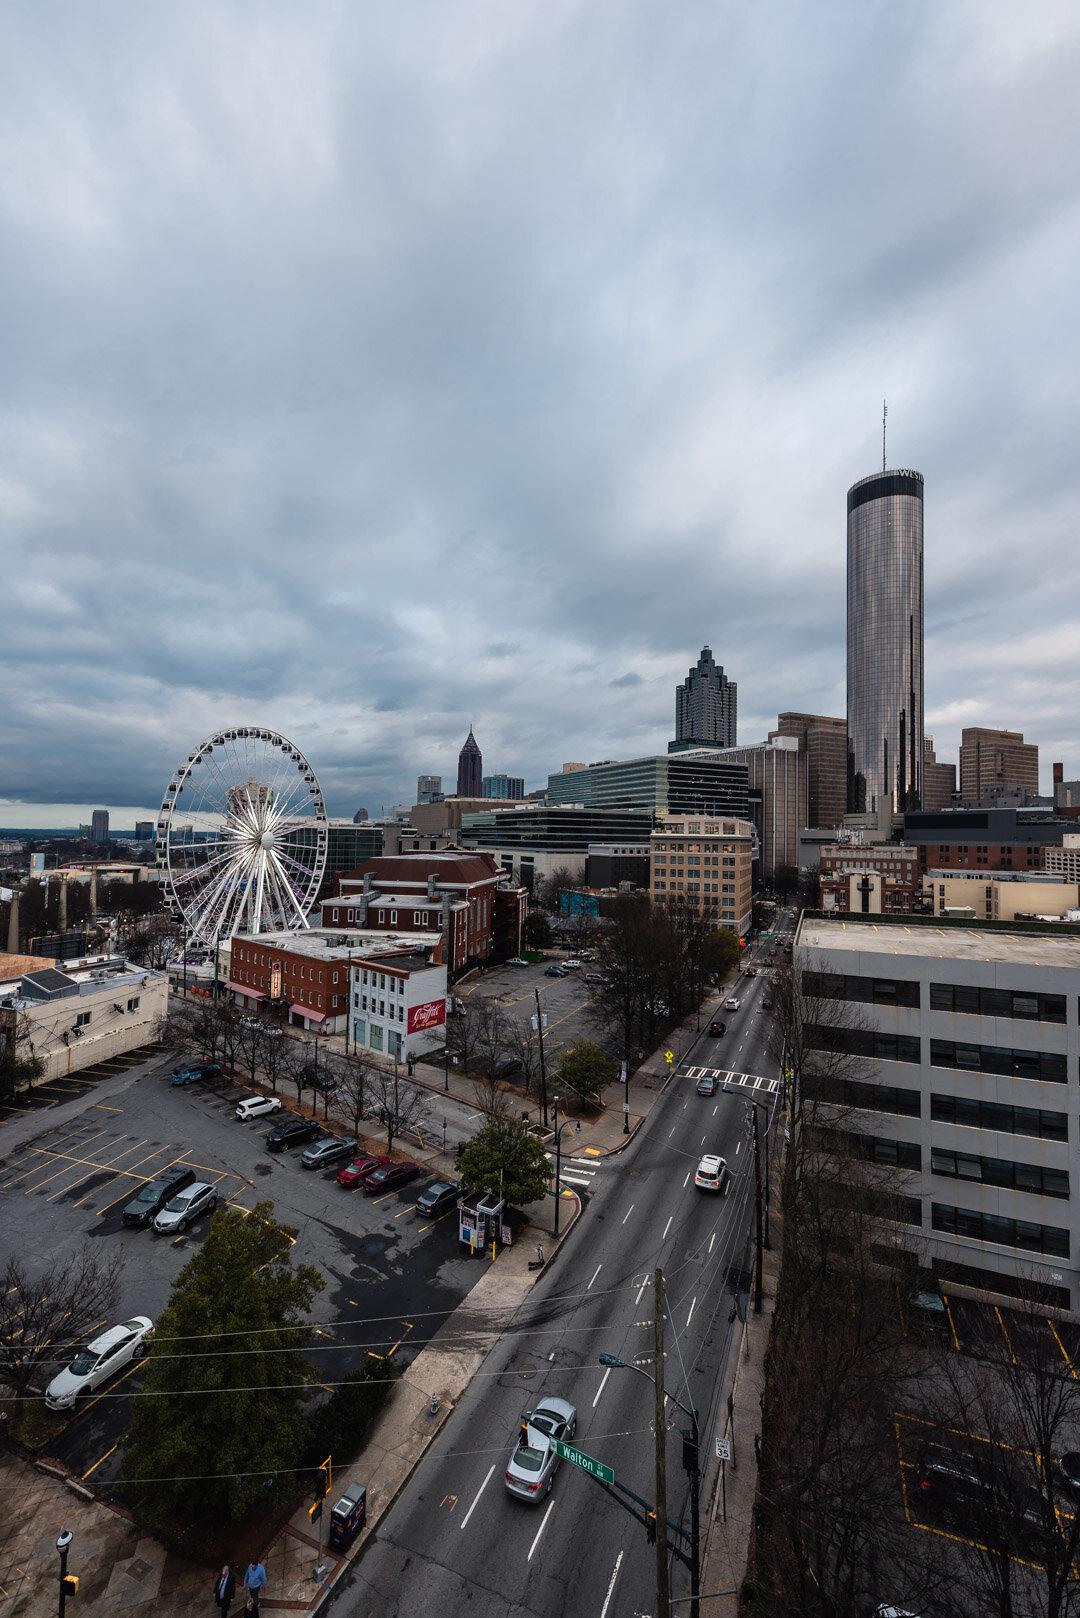 Centennial Olympic Park Parking Garage Atlanta Overcast